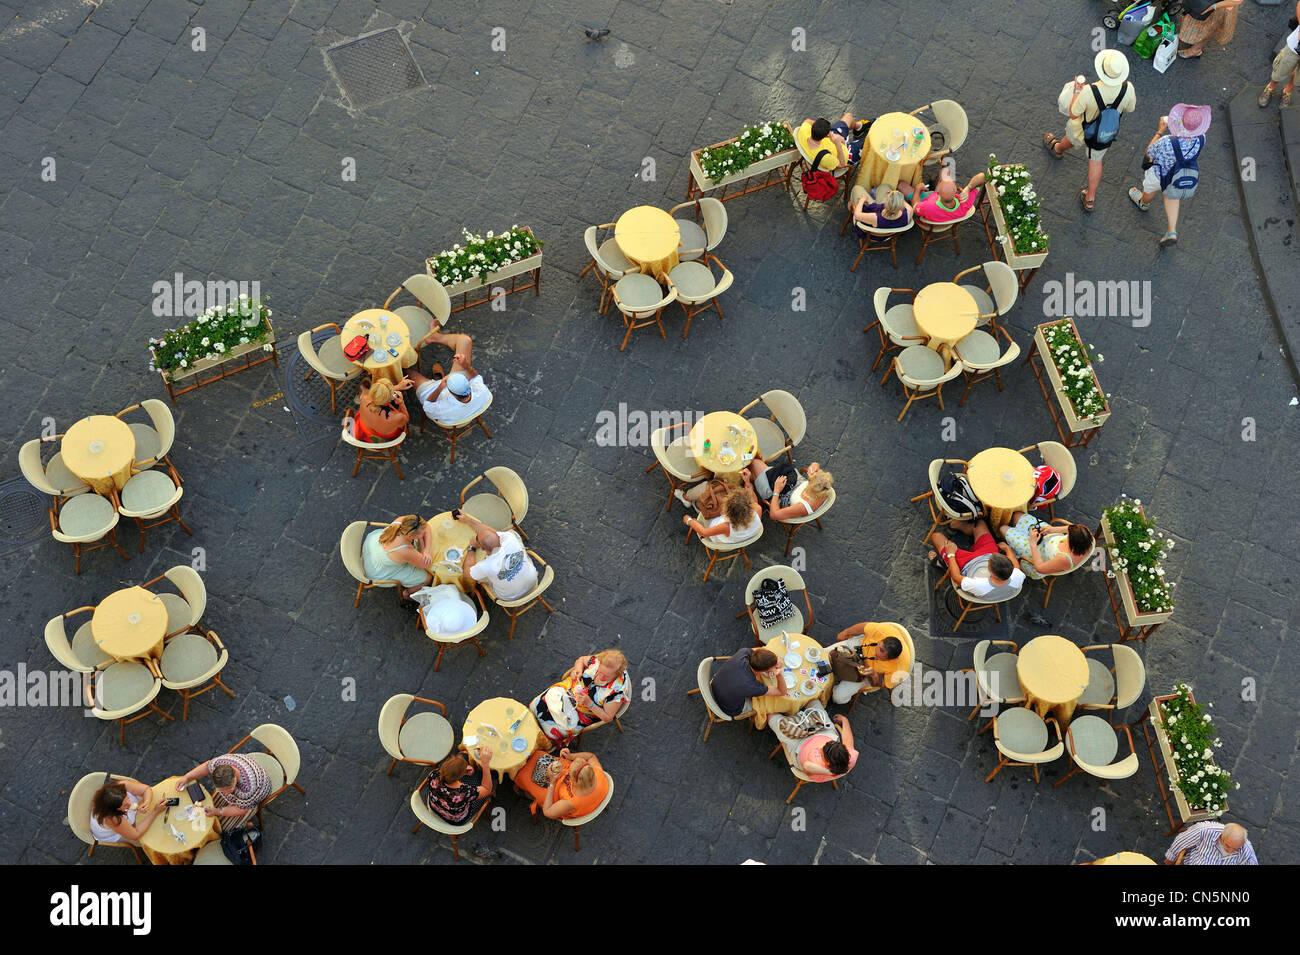 Italy, Campania, Amalfi Coast, listed as World Heritage by UNESCO, Amalfi, piazza Duomo - Stock Image